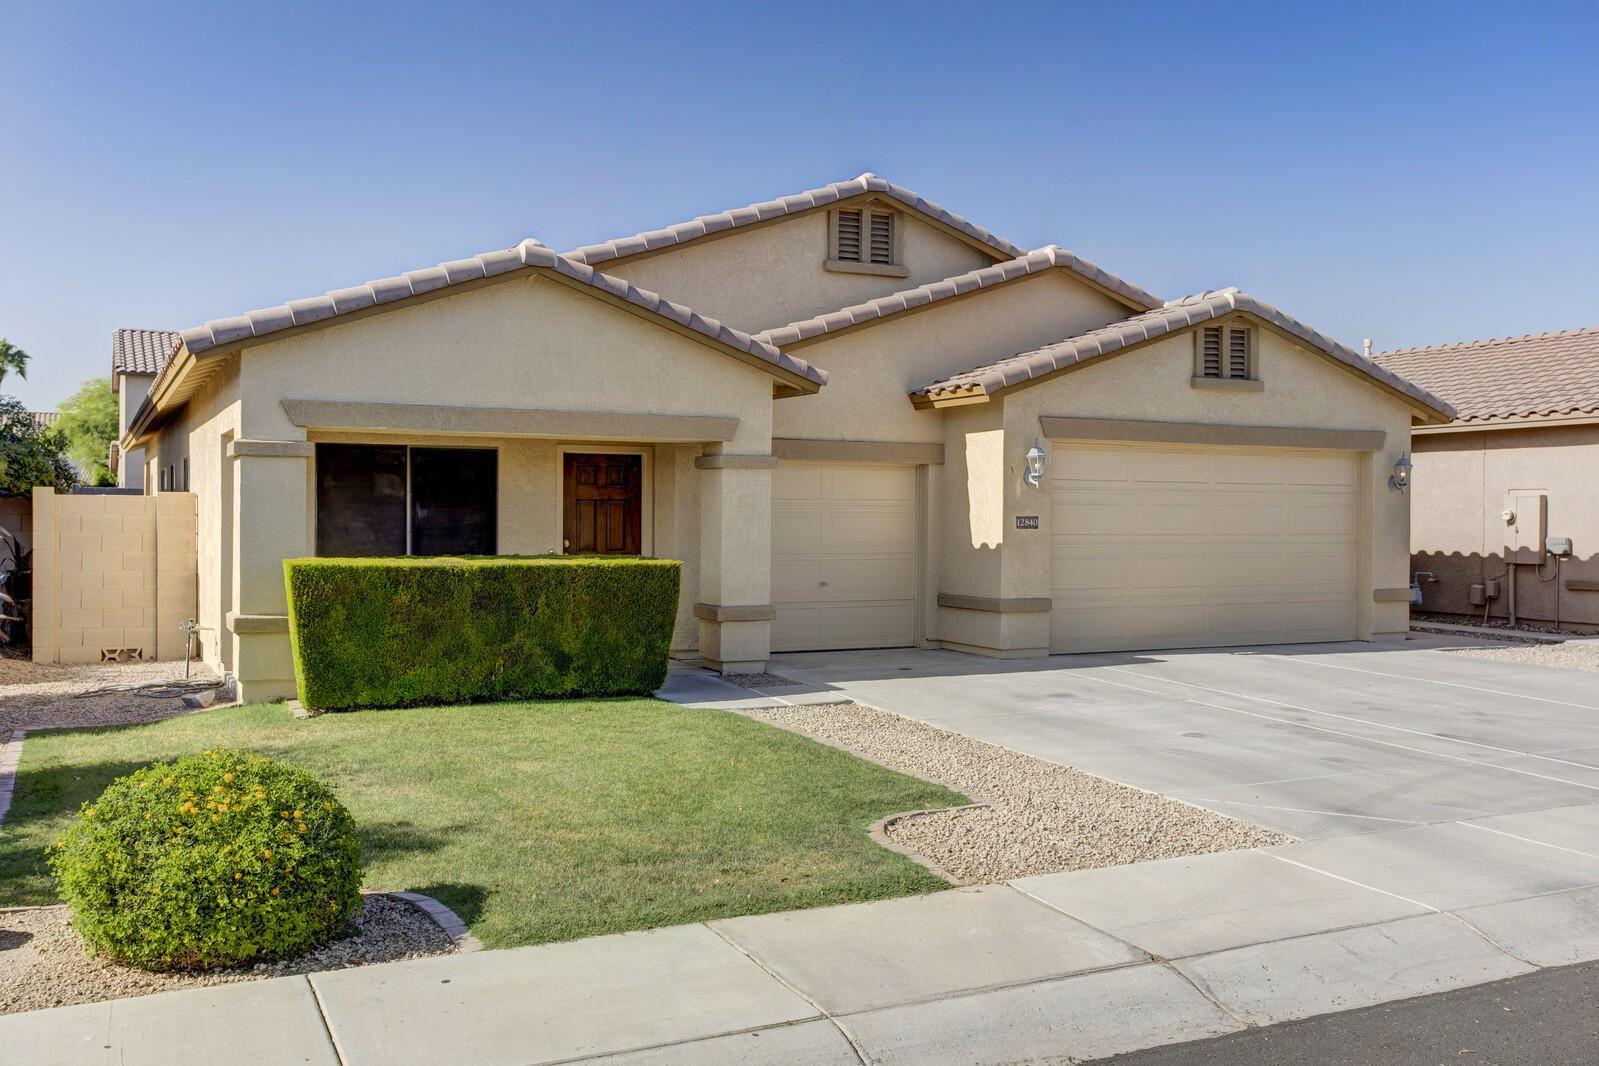 12840 W WELDON Avenue, Avondale, AZ 85392 - MLS#: 6236585